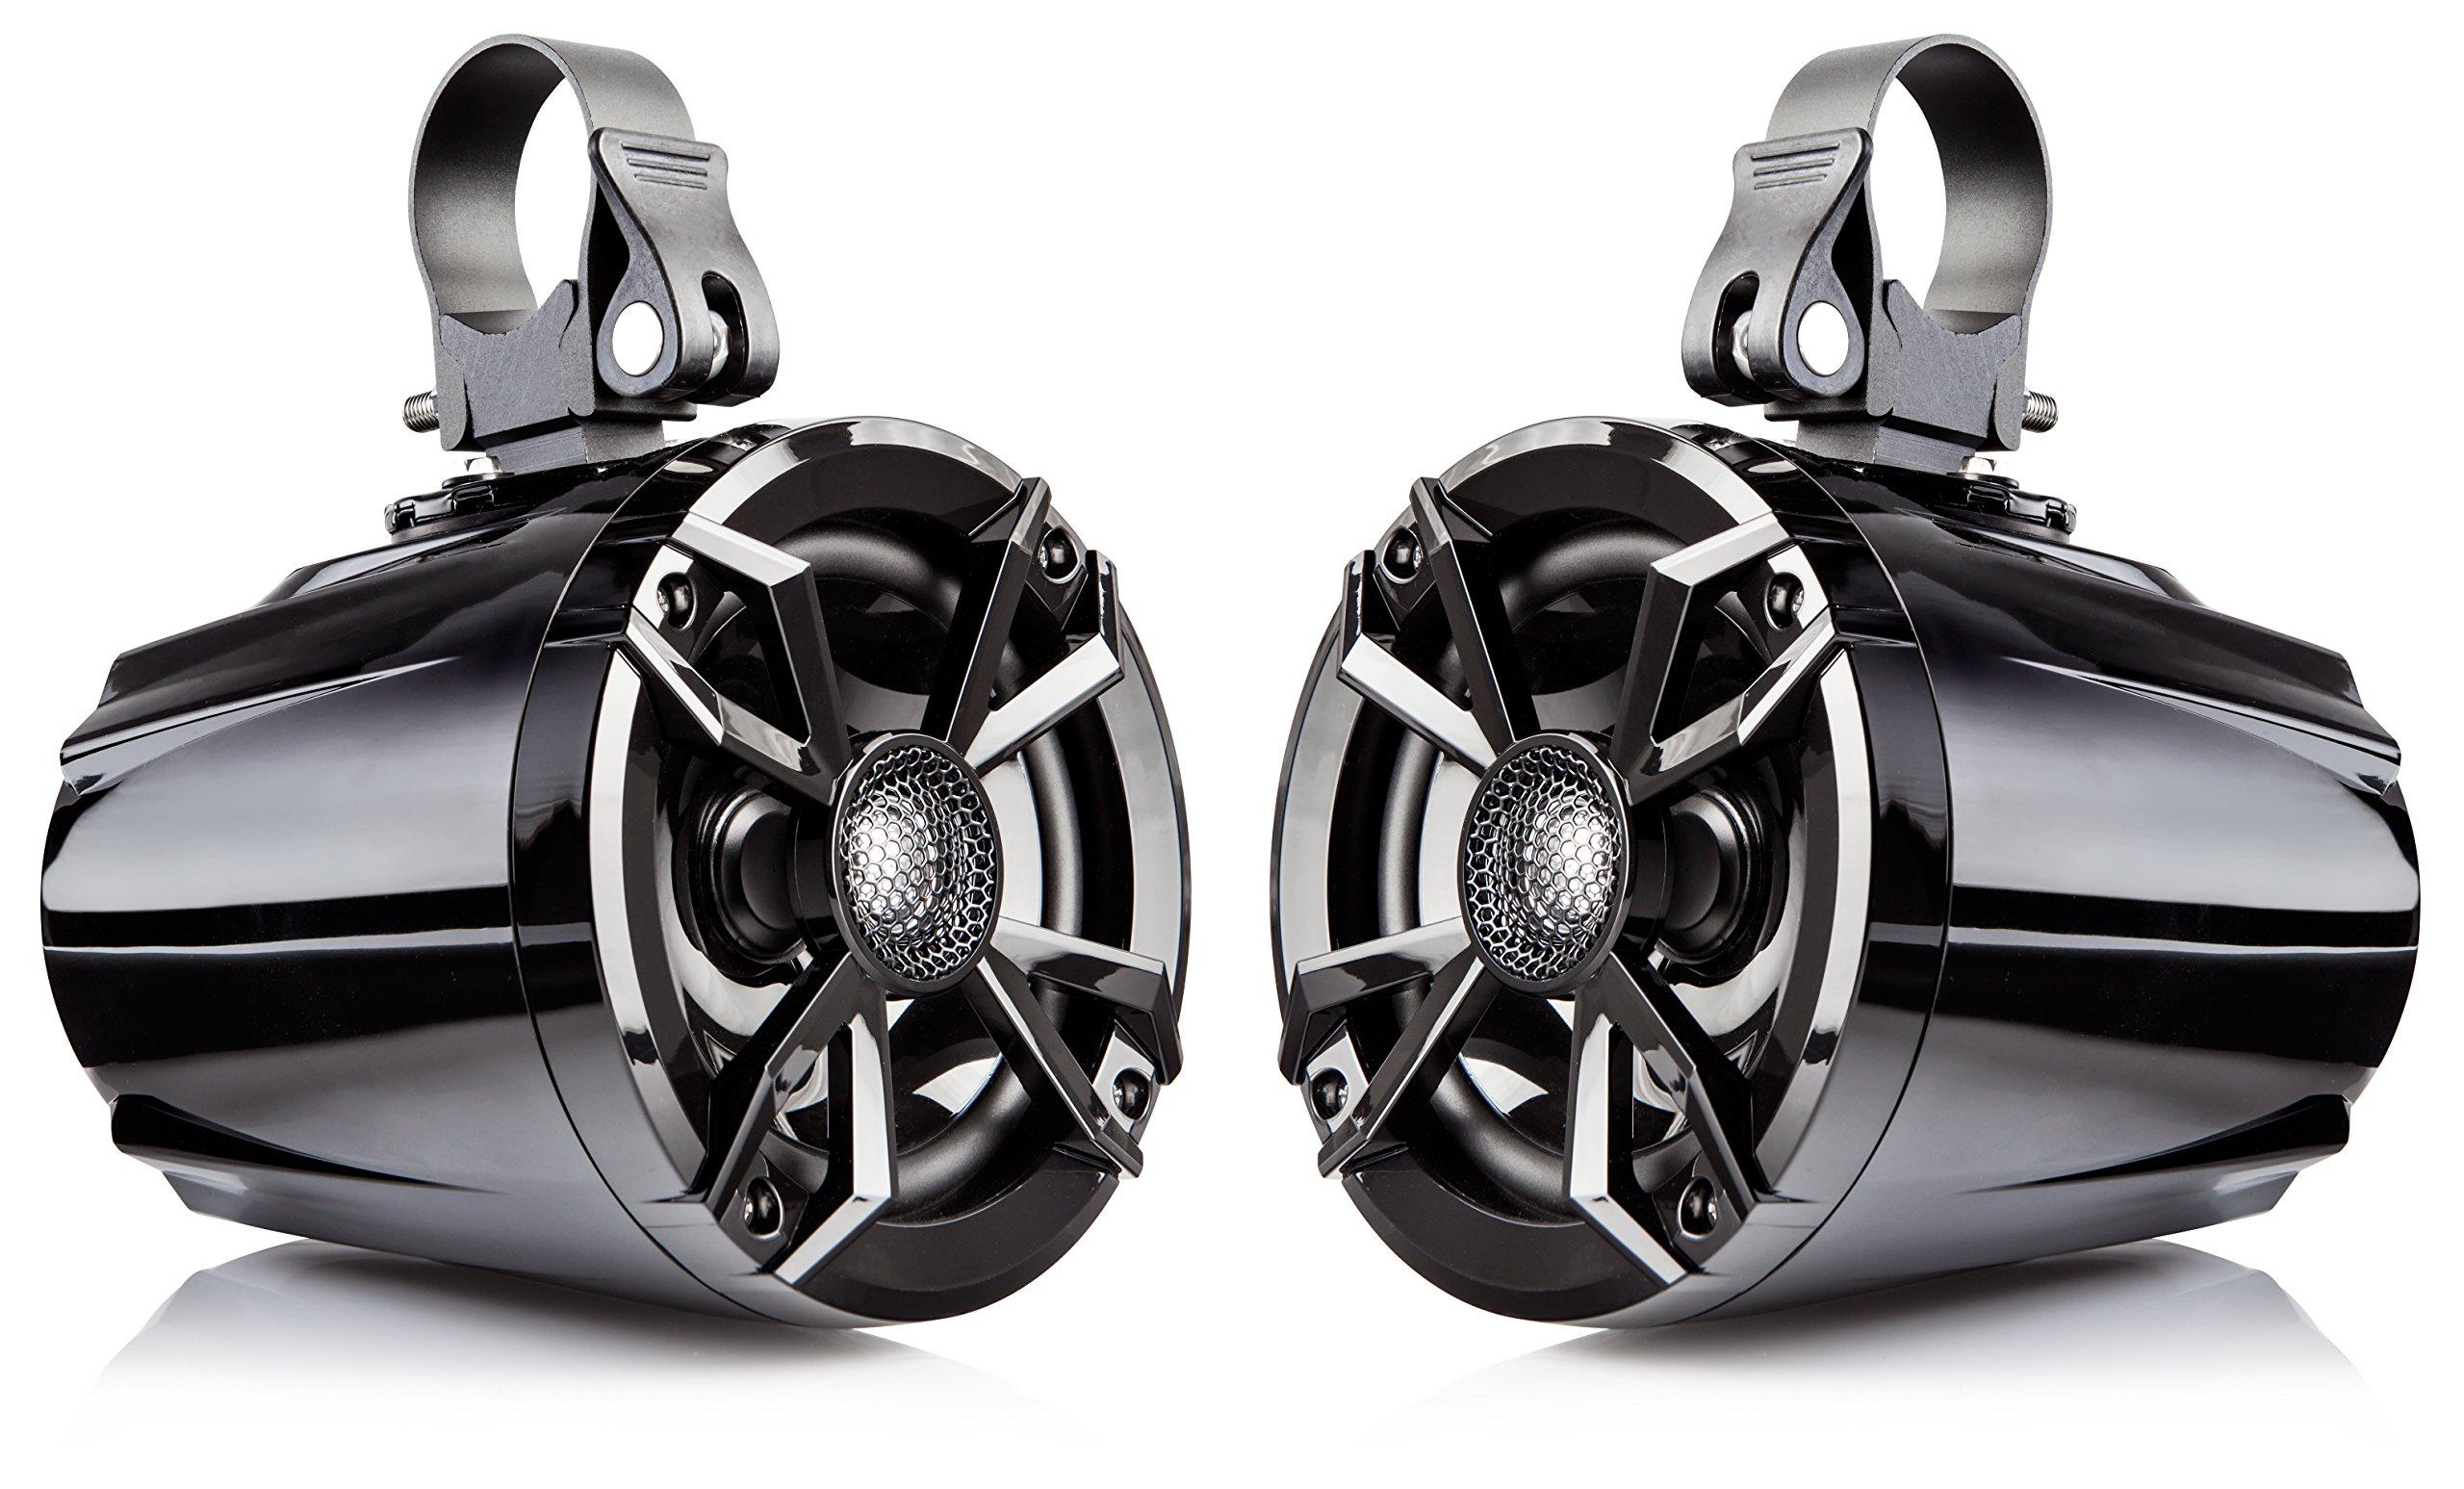 NOAM N5 - Pair of 5.25'' UTV/Golf Cart Marine Speakers with Passive Radiator (Pair of Passive Speakers. not Including Amplifier) by NOAM